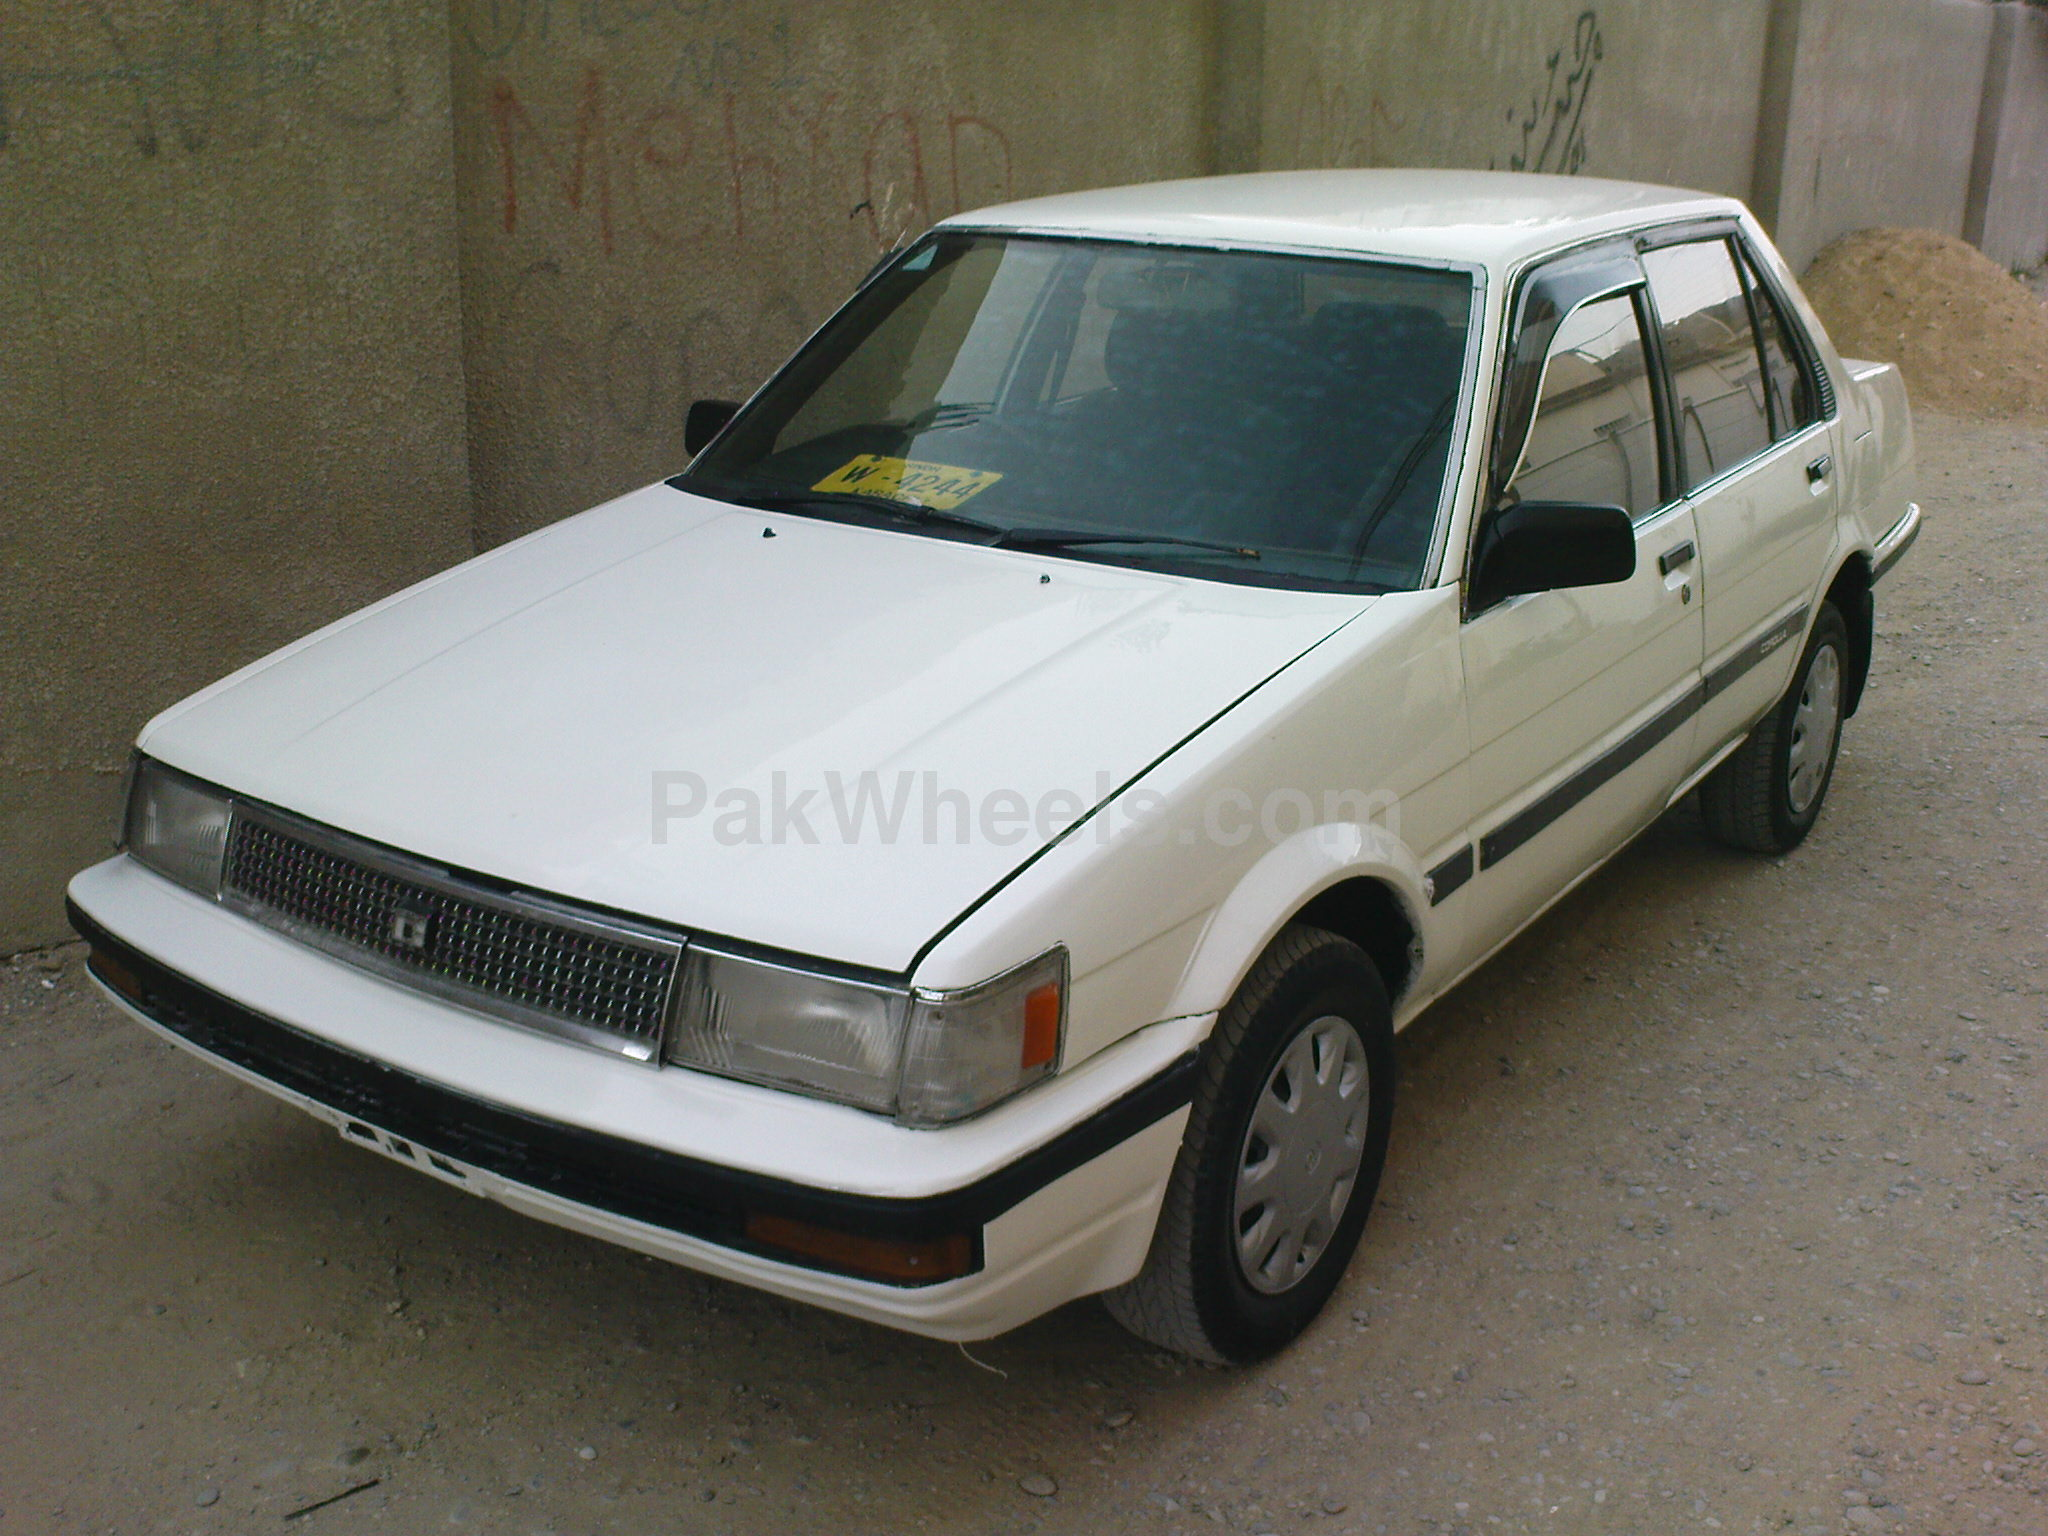 used toyota corolla 1986 car for sale in karachi 107870 pakwheels. Black Bedroom Furniture Sets. Home Design Ideas